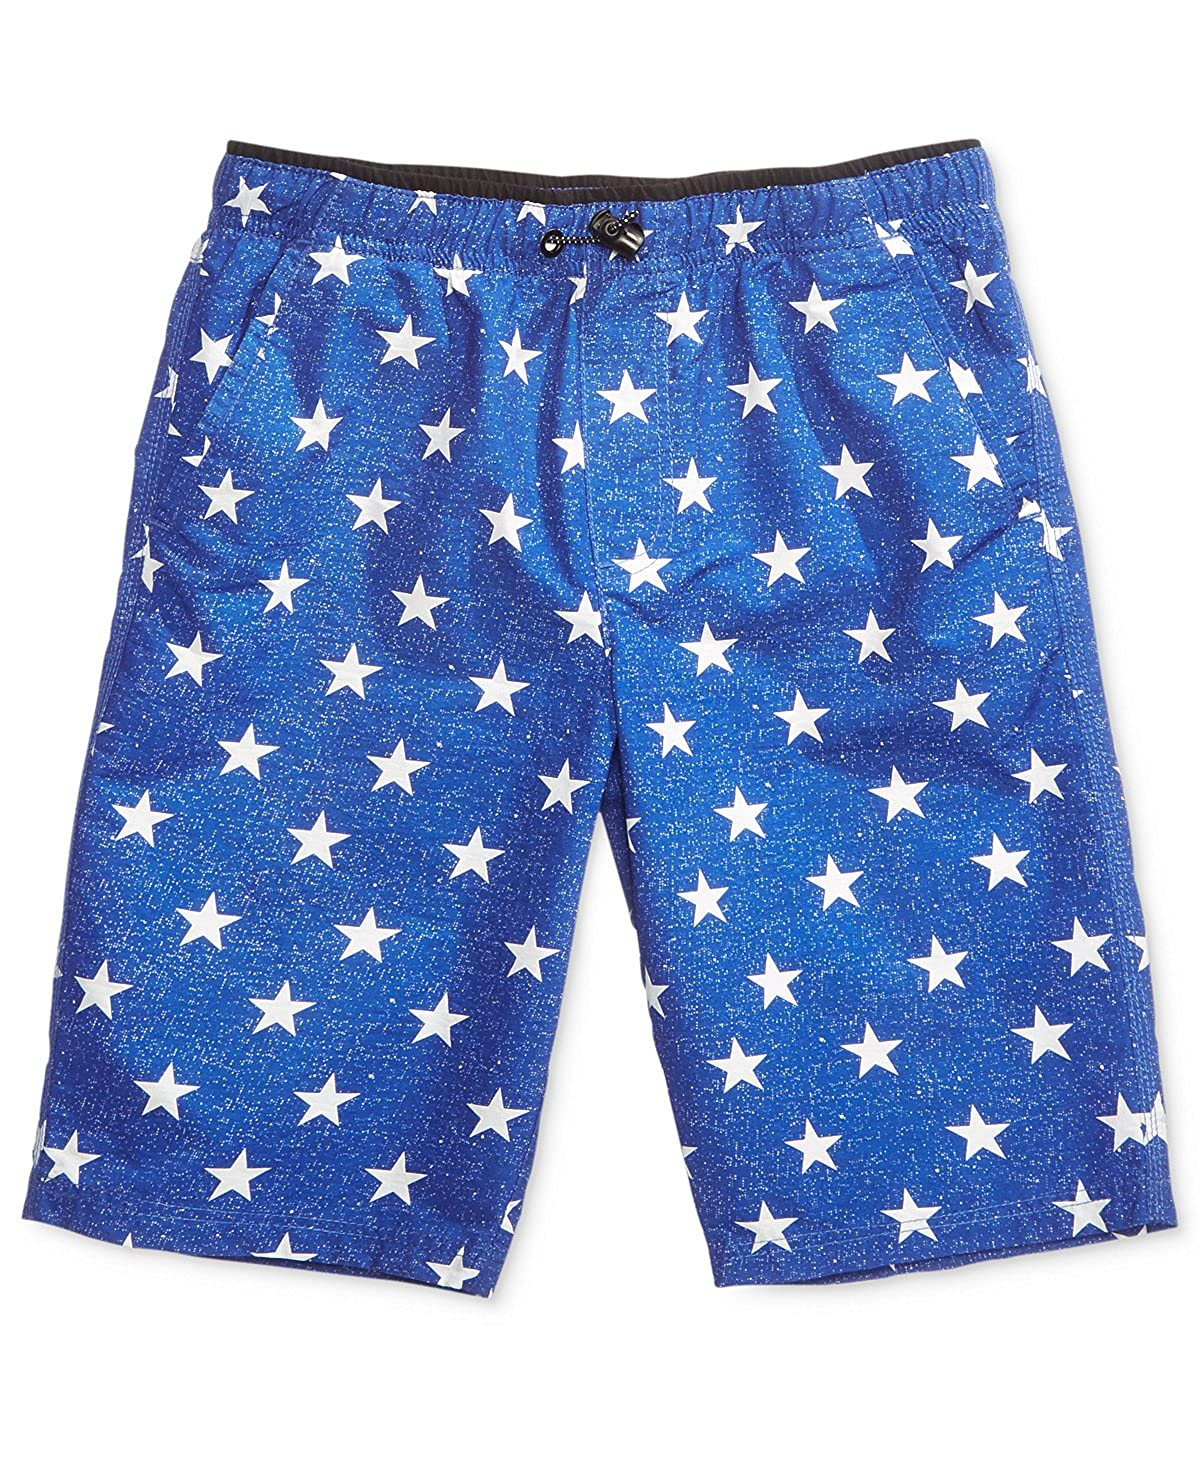 Univibe Graphic-Print Shorts Blue Size: L Big Boys